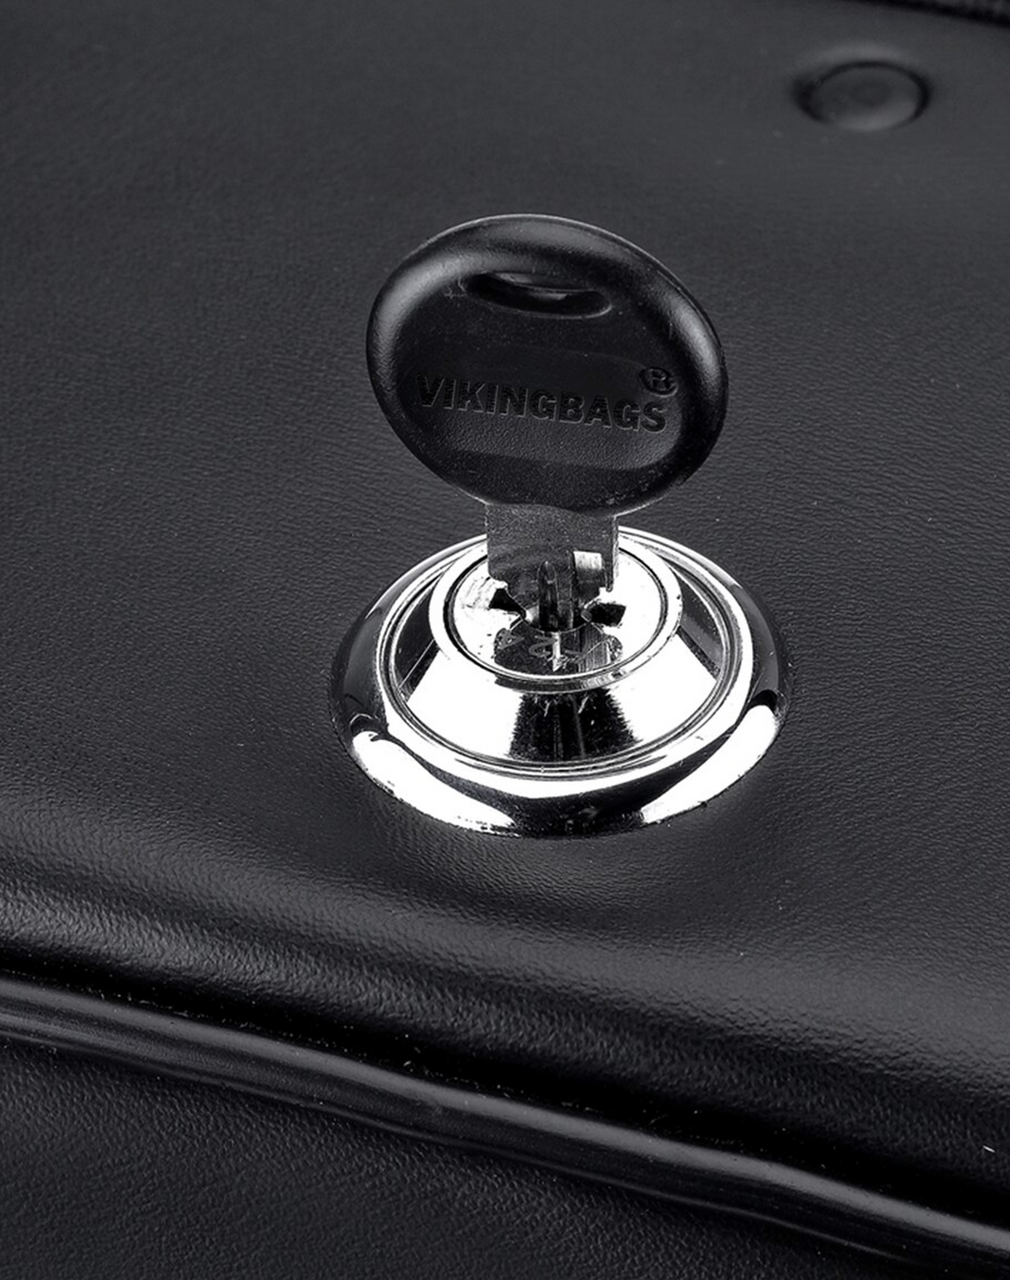 Honda VTX 1800 N SS Shock Cutout Slanted Studded L Motorcycle Saddlebags Key Lock View